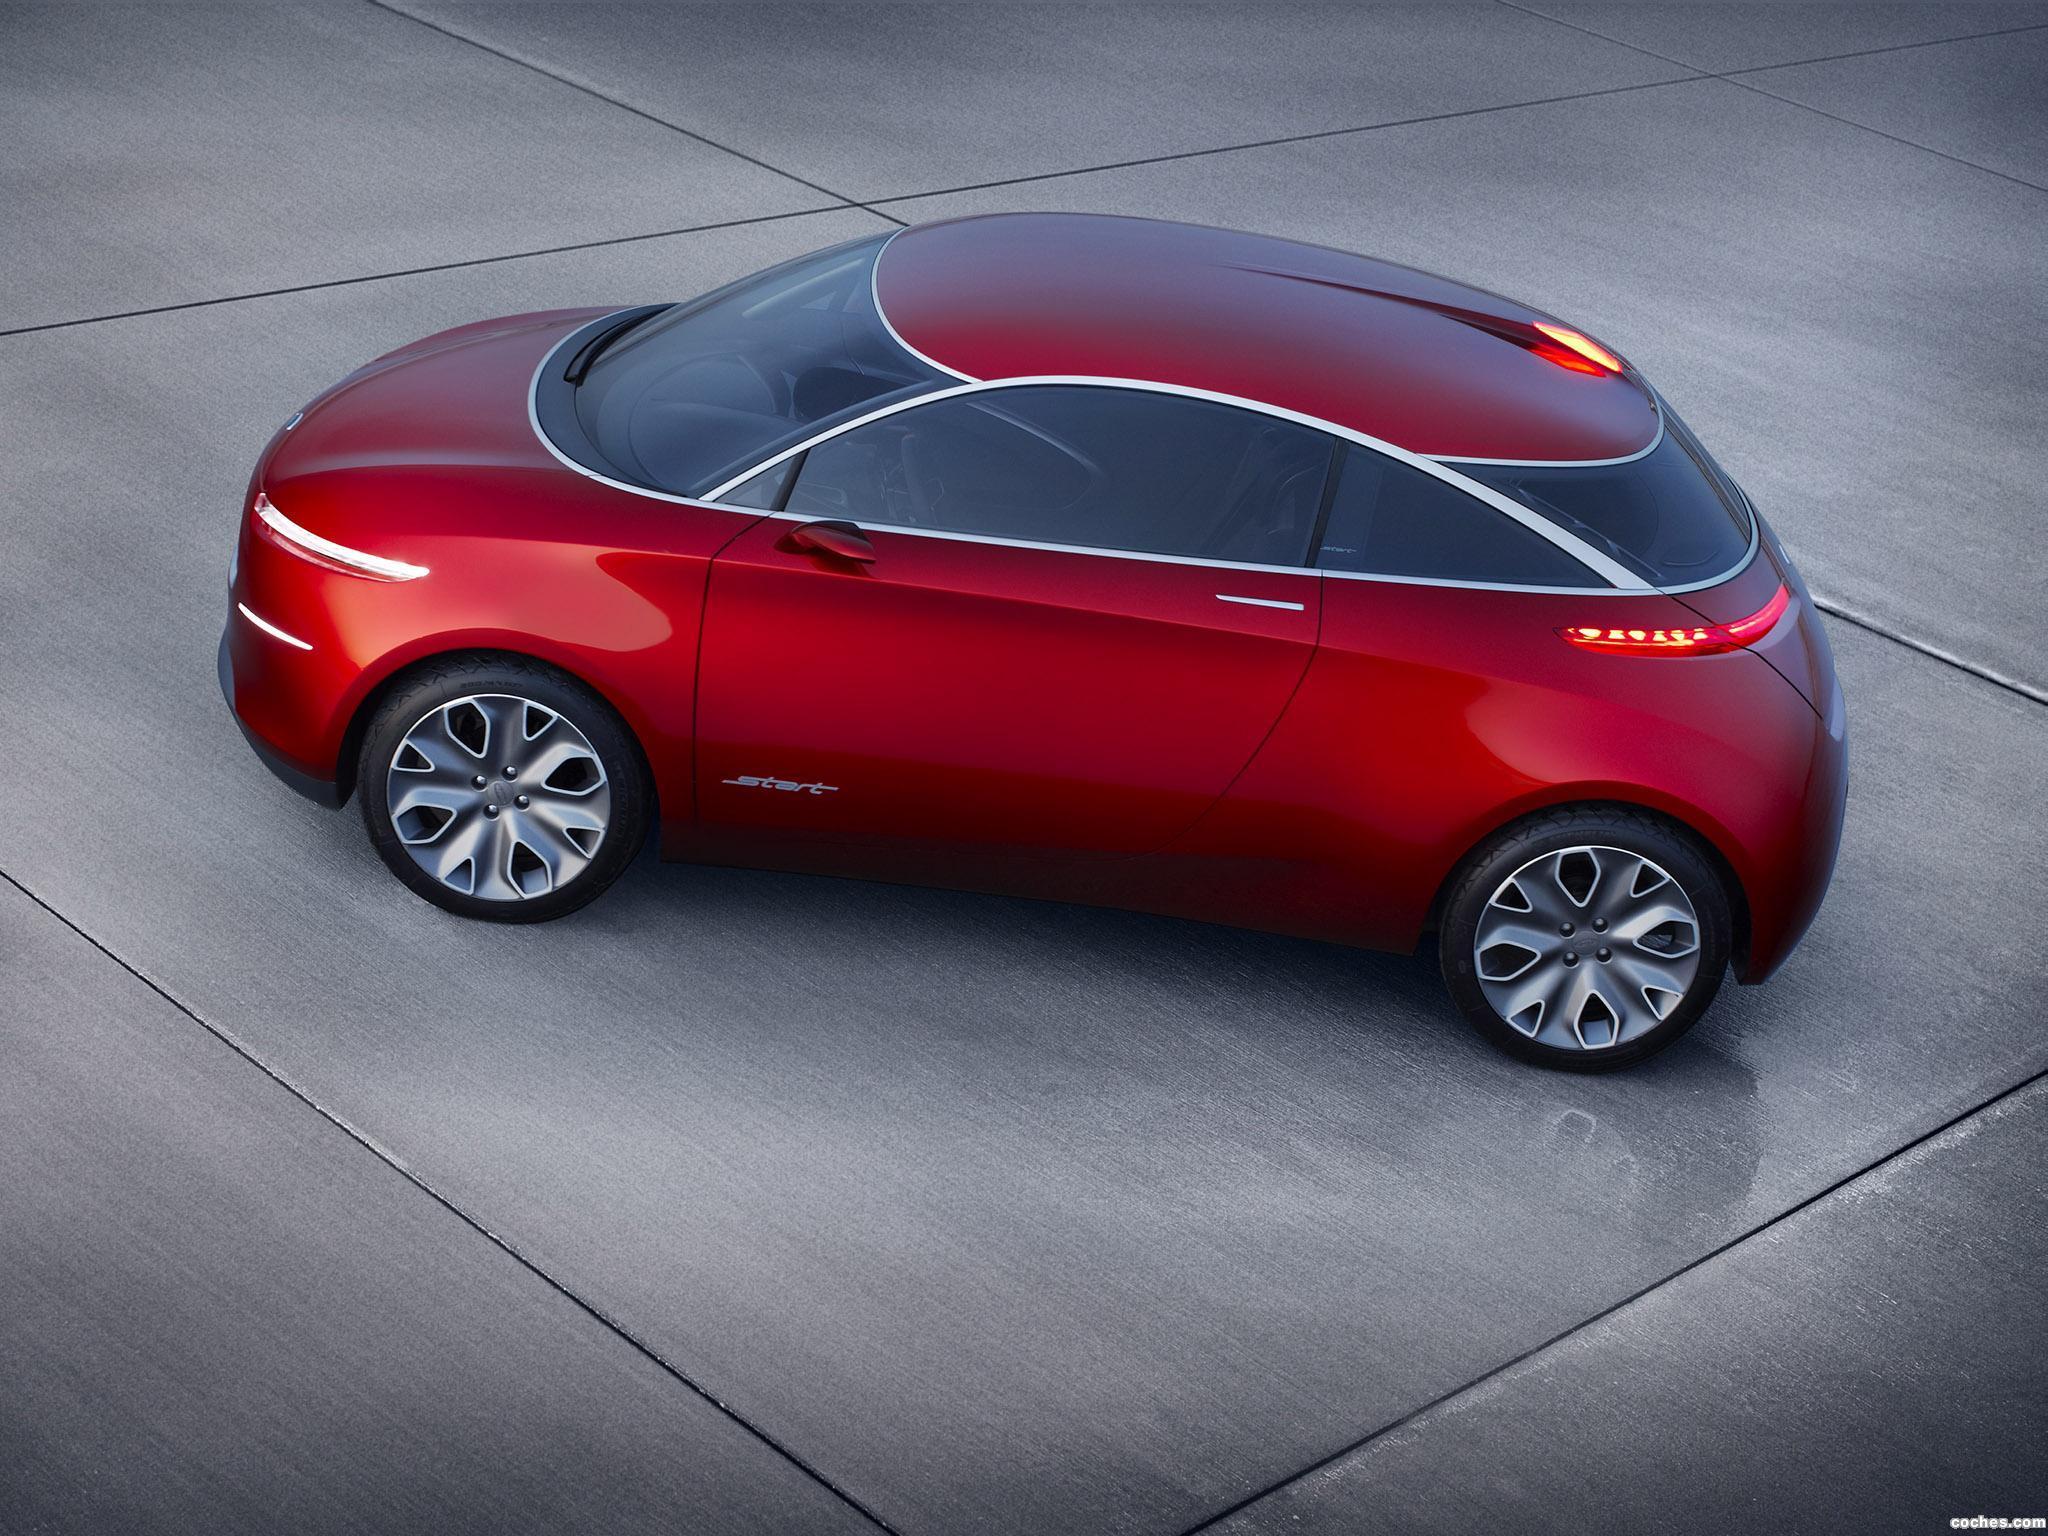 Foto 9 de Ford Start Concept 2010